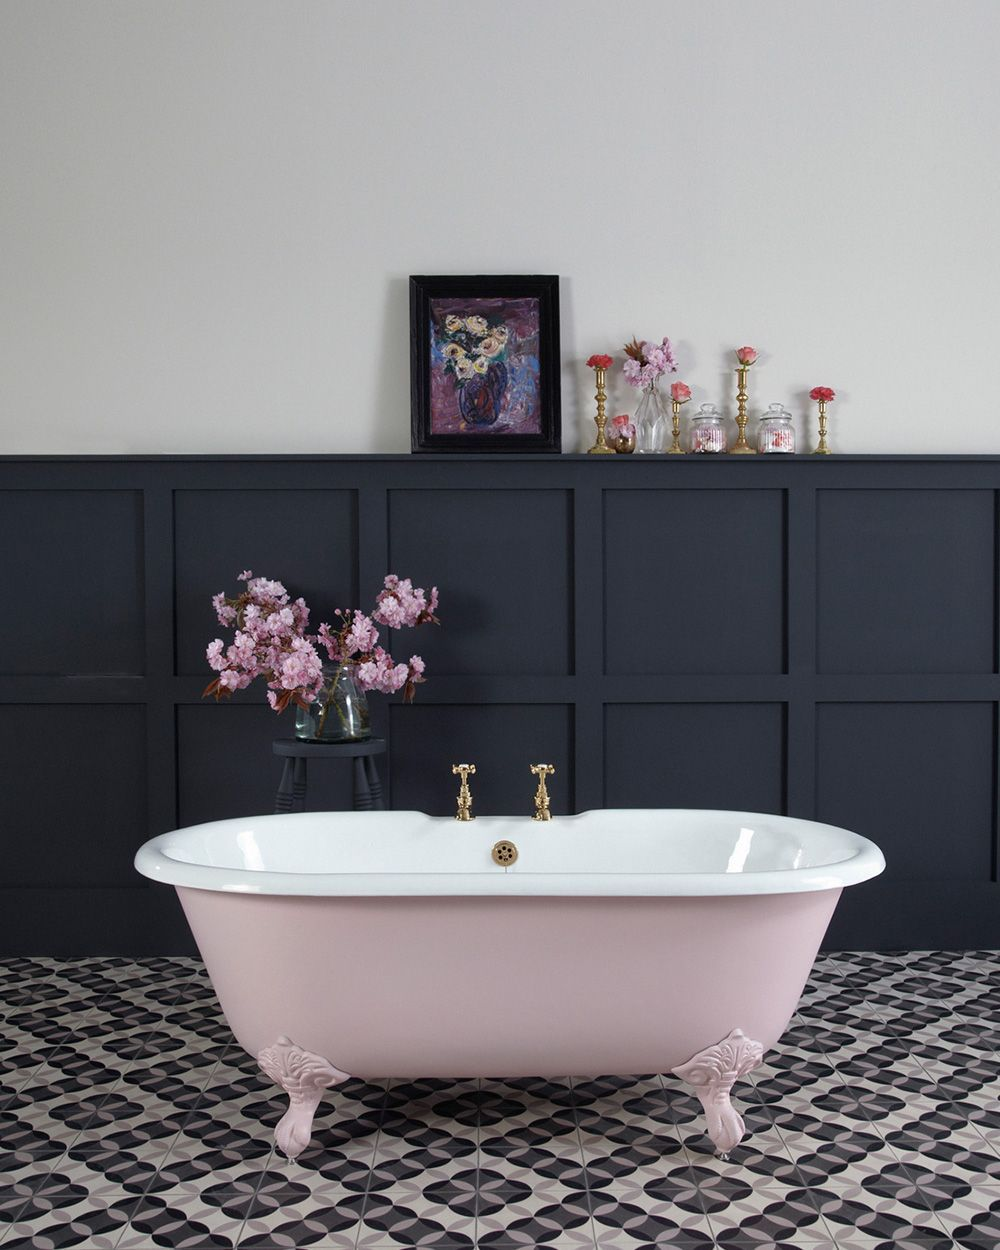 baignoire rose salle de bain #retrohomedecor | Retro Home Decor ...